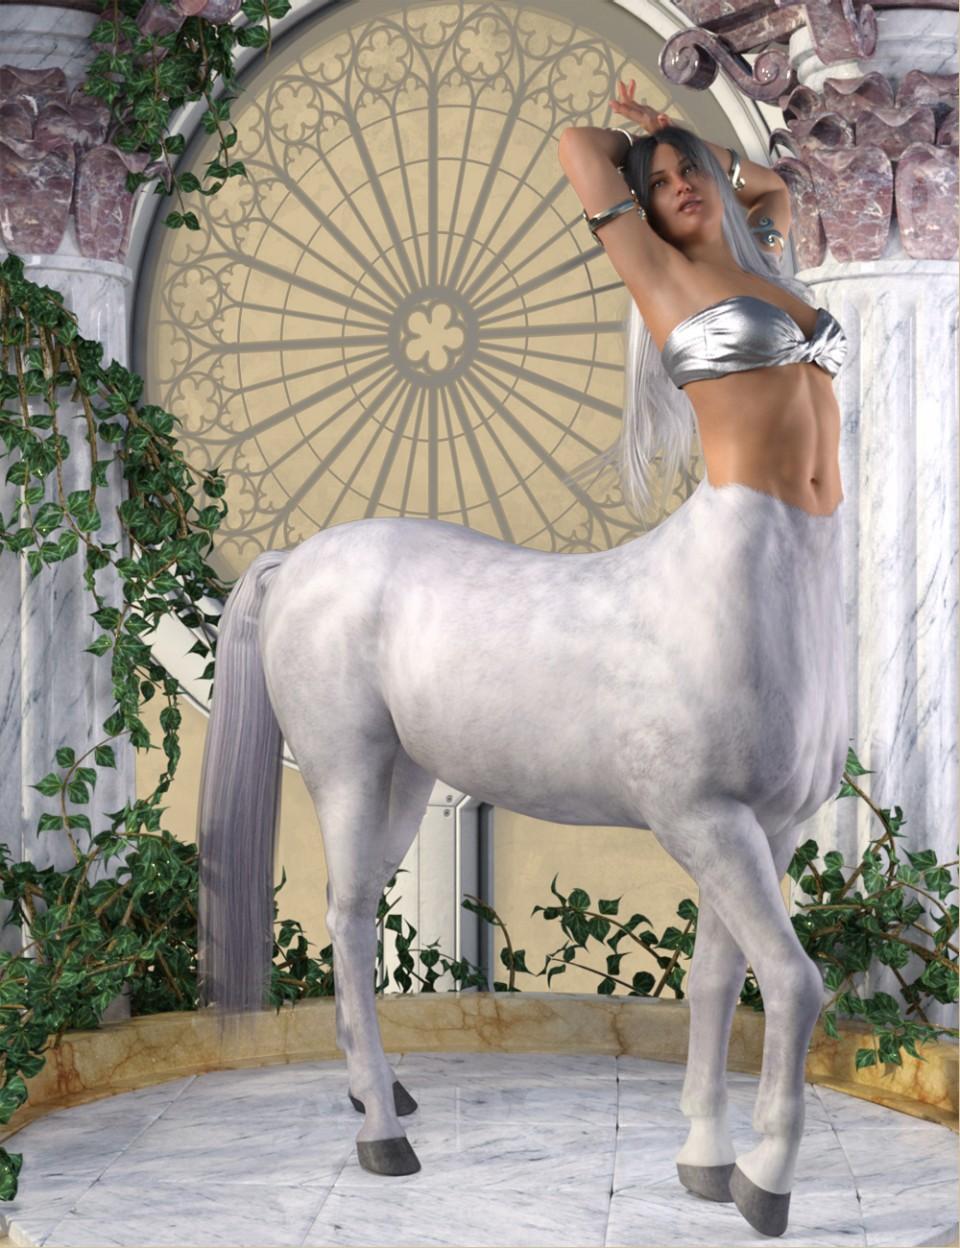 Centaur Action Poses for Genesis 8 Female Centaur_DAZ3D下载站